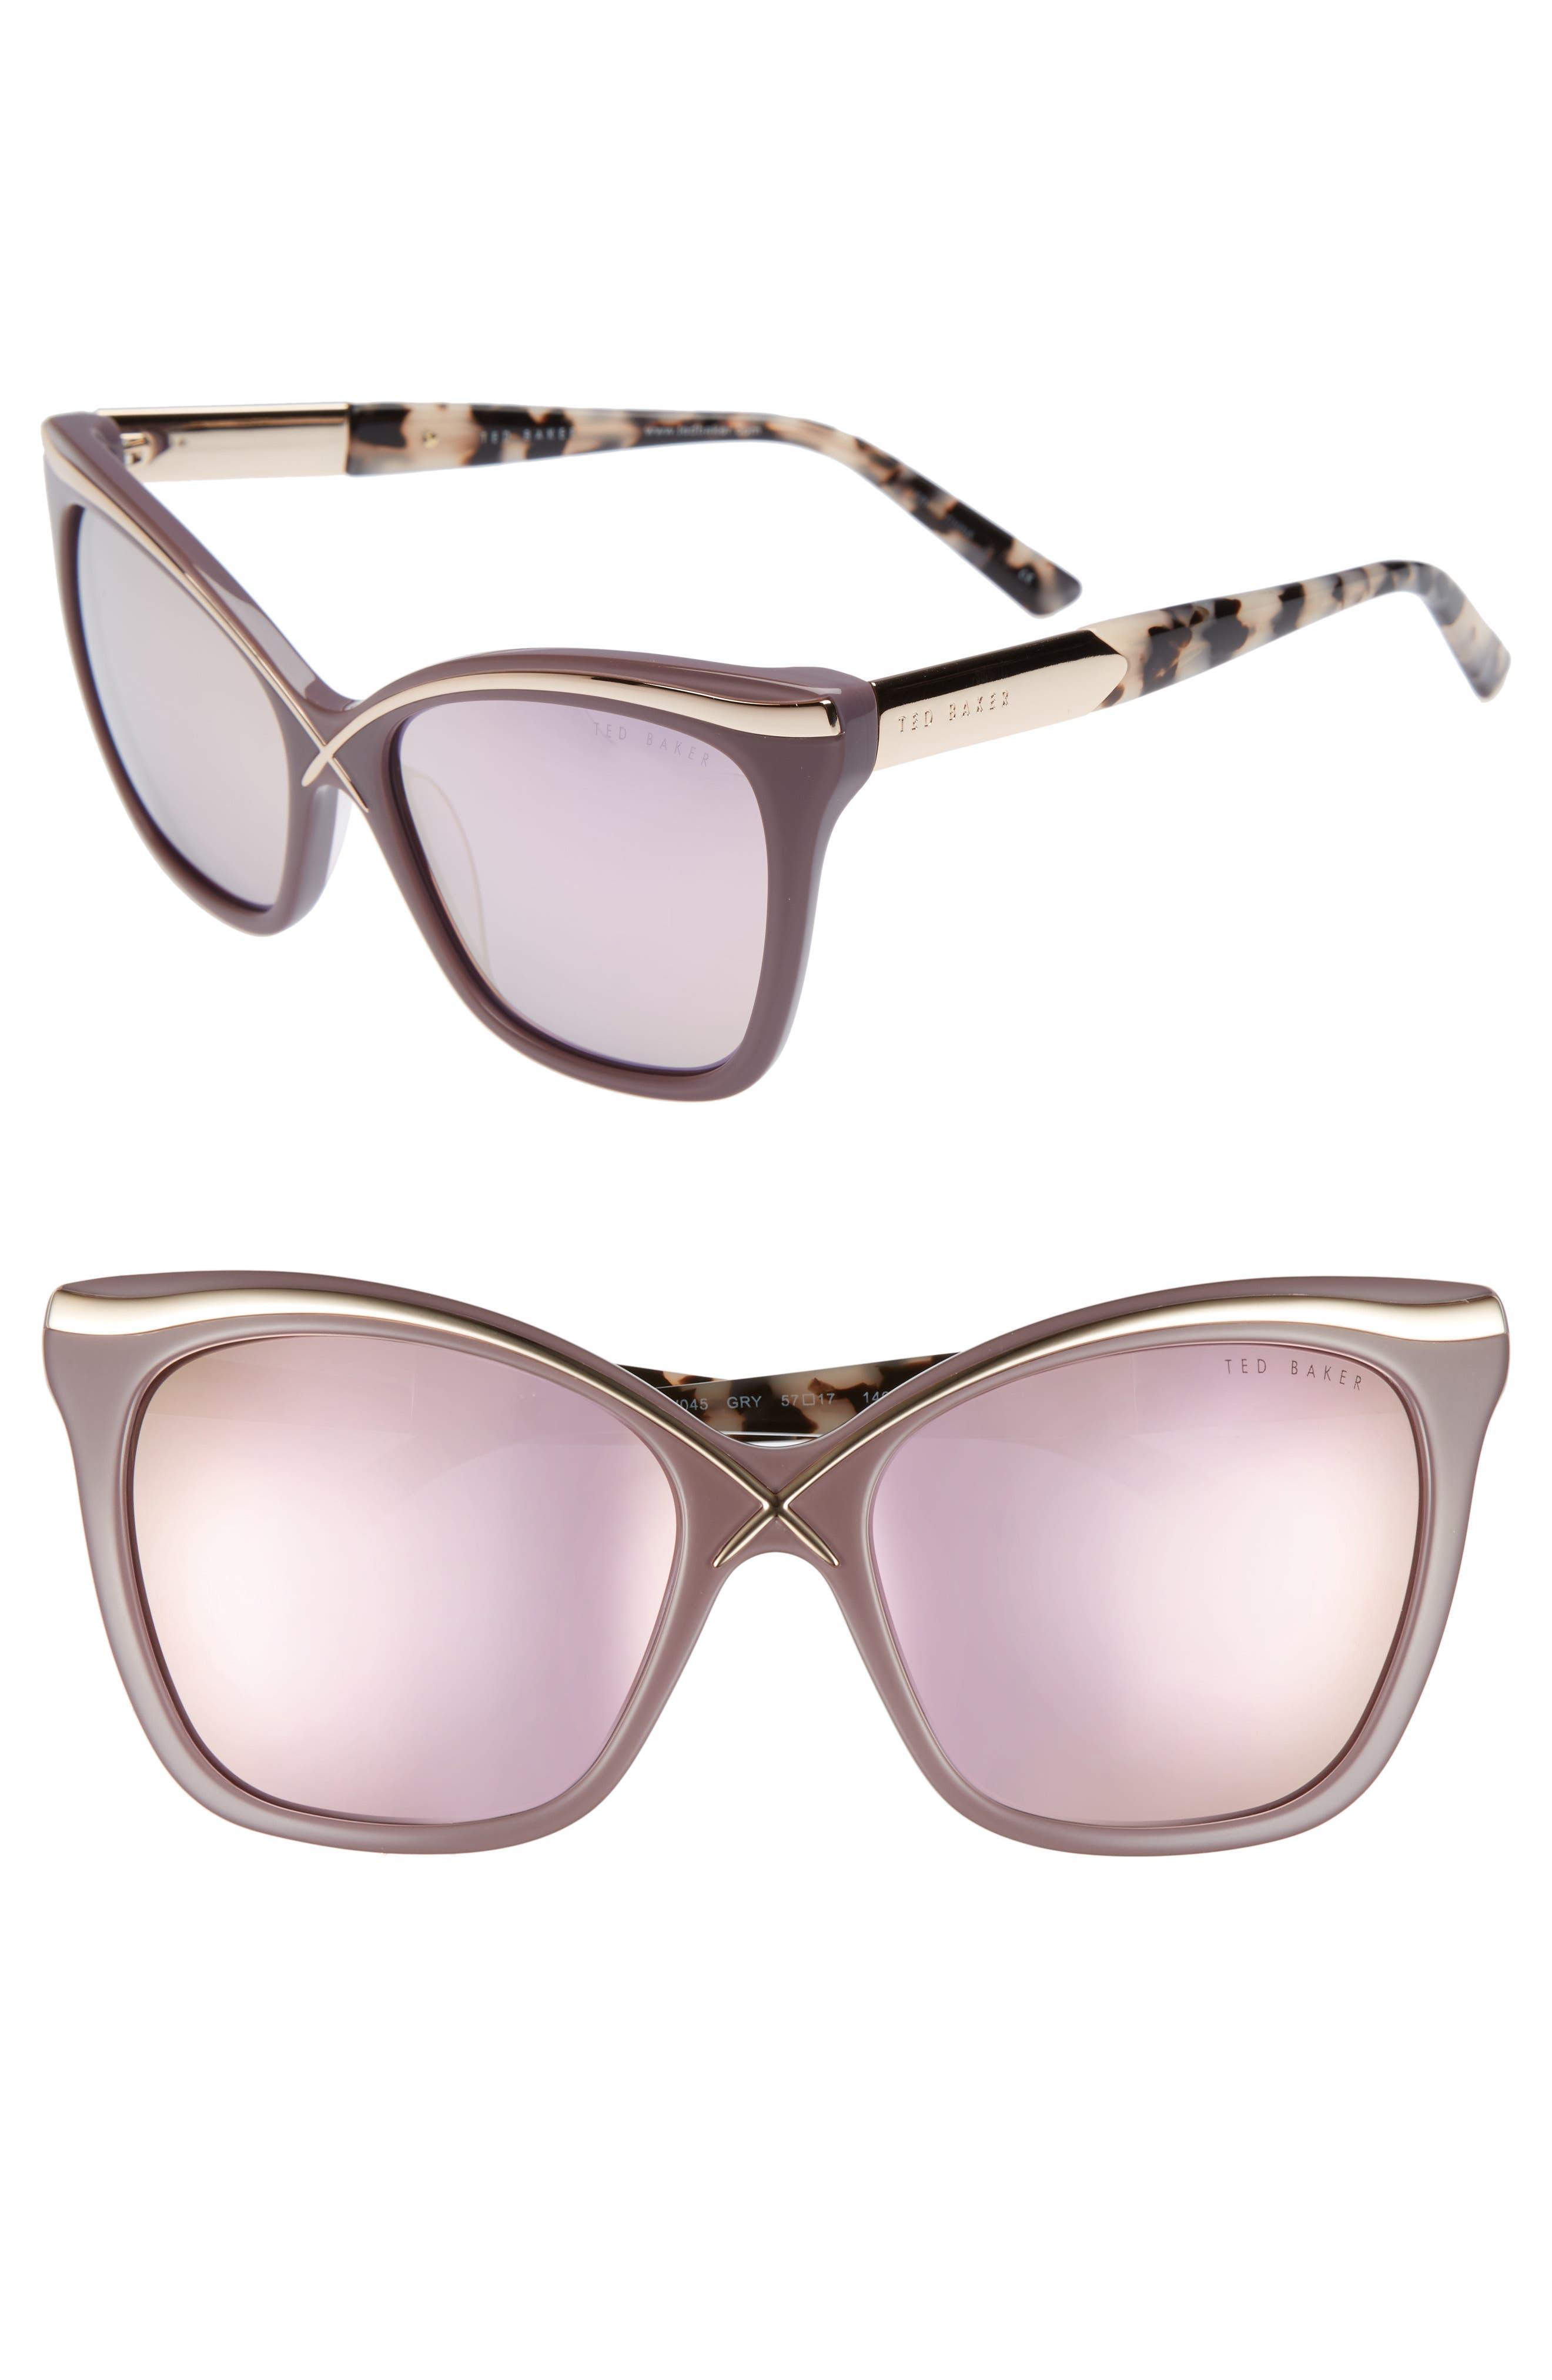 57mm Square Cat Eye Sunglasses,                             Main thumbnail 1, color,                             Grey